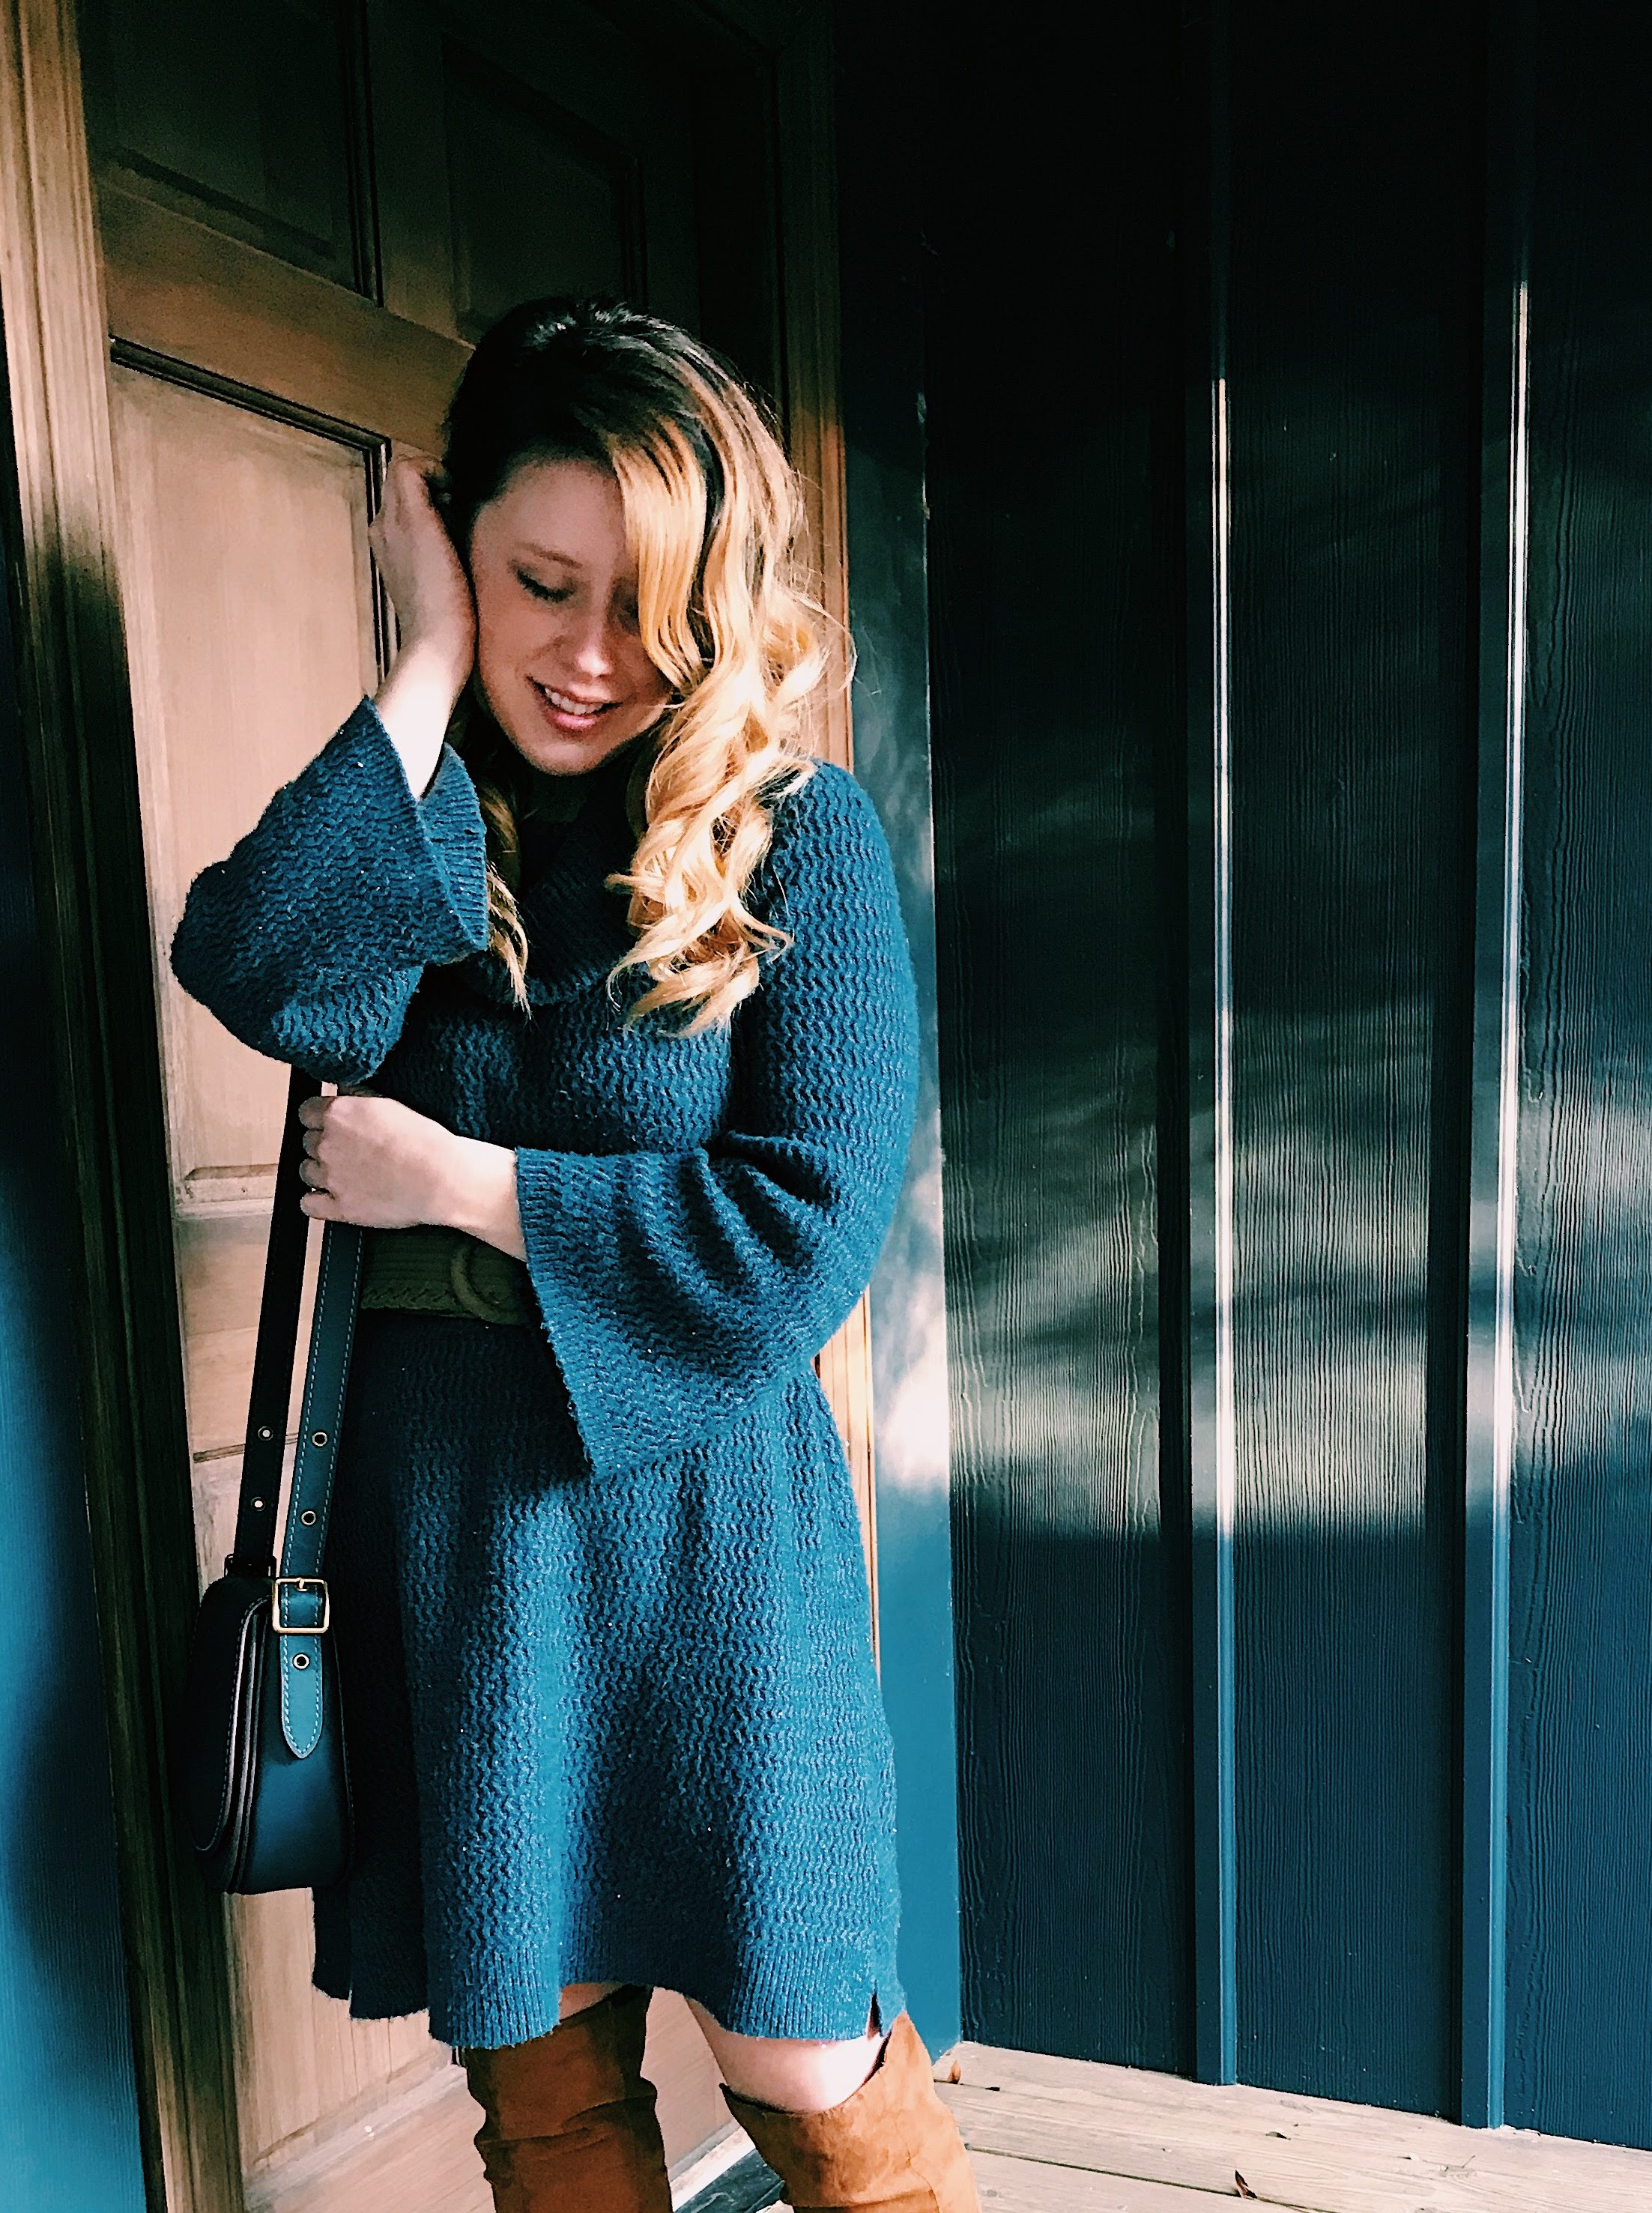 Three Heel Clicks - Styling a Sweater Dress from LOFT (13).jpg